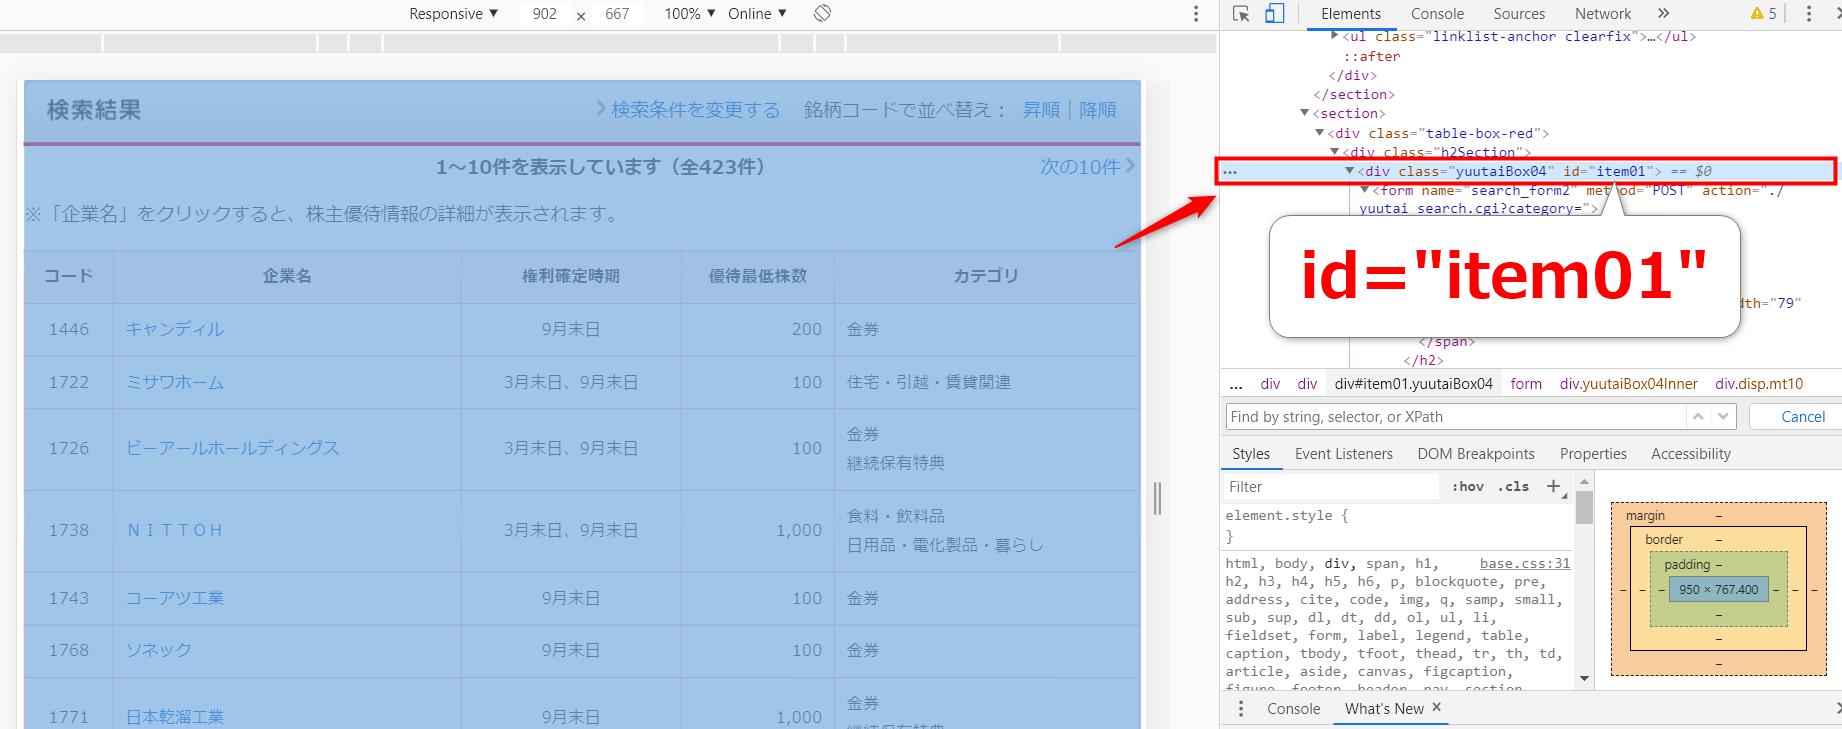 Chromeで検索結果のHTMLを検証